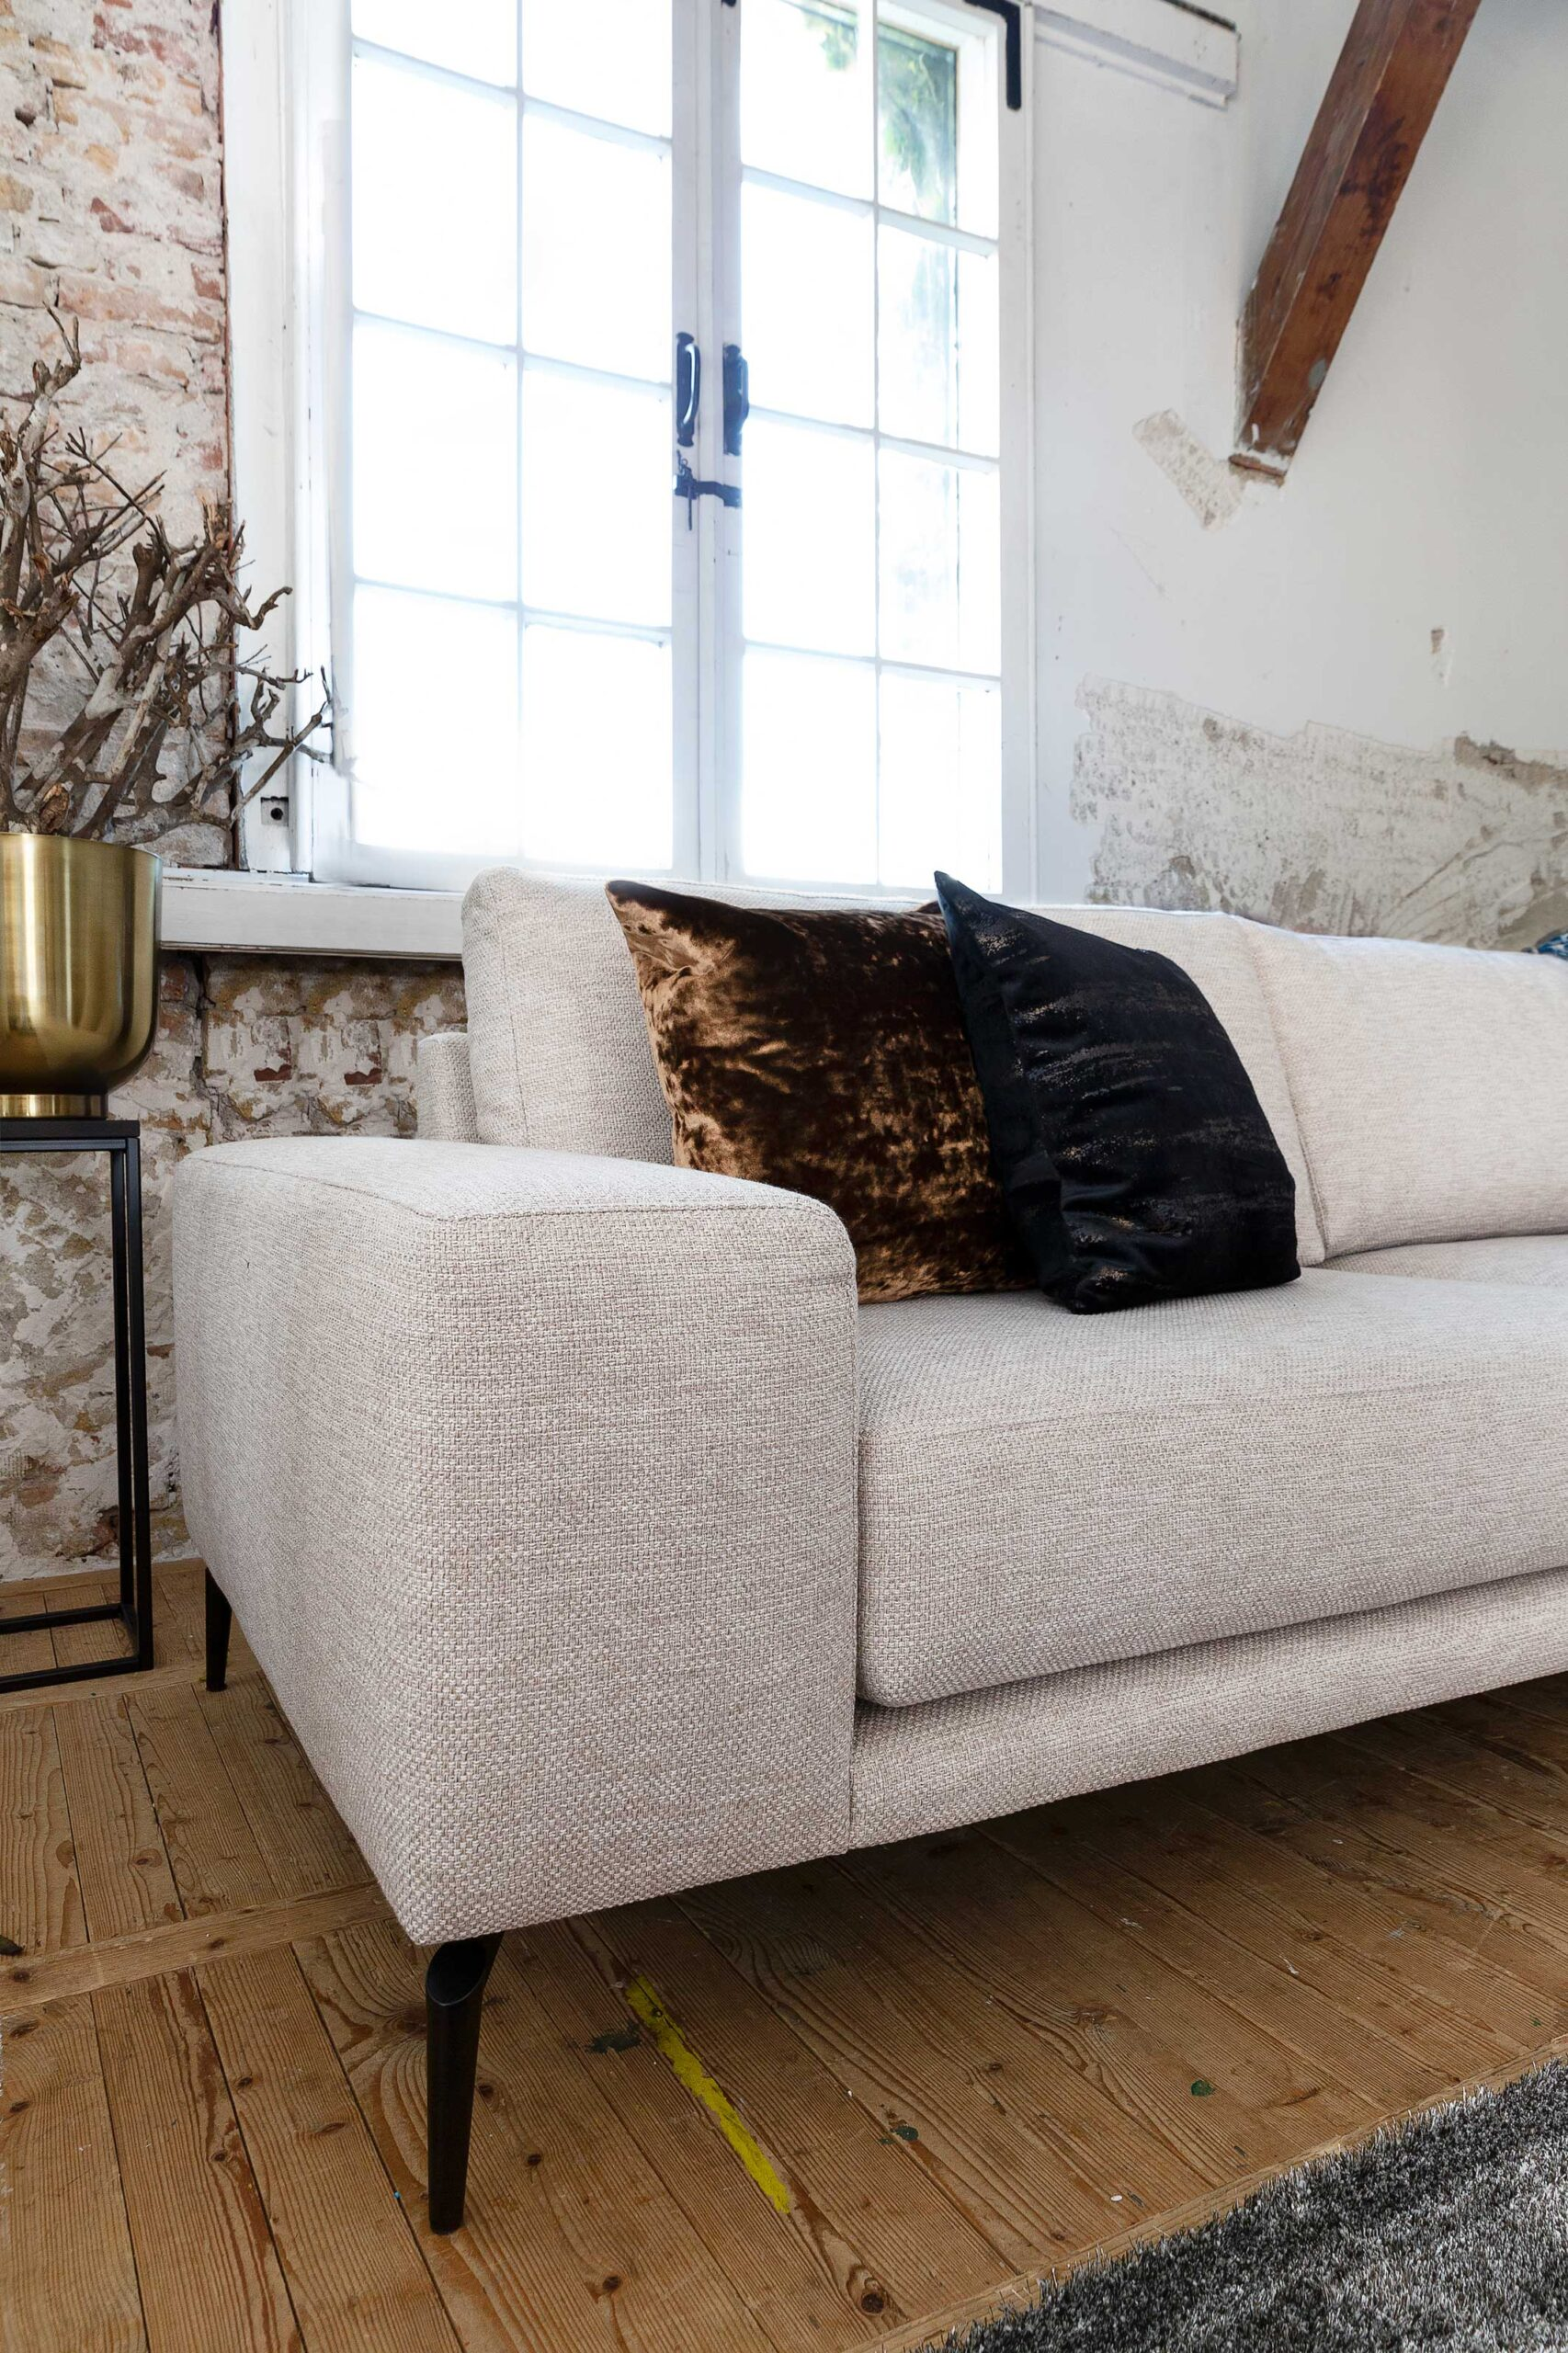 bella-milano-detailfoto-italiaans-ontwerp-armleuning-soofs-interieur